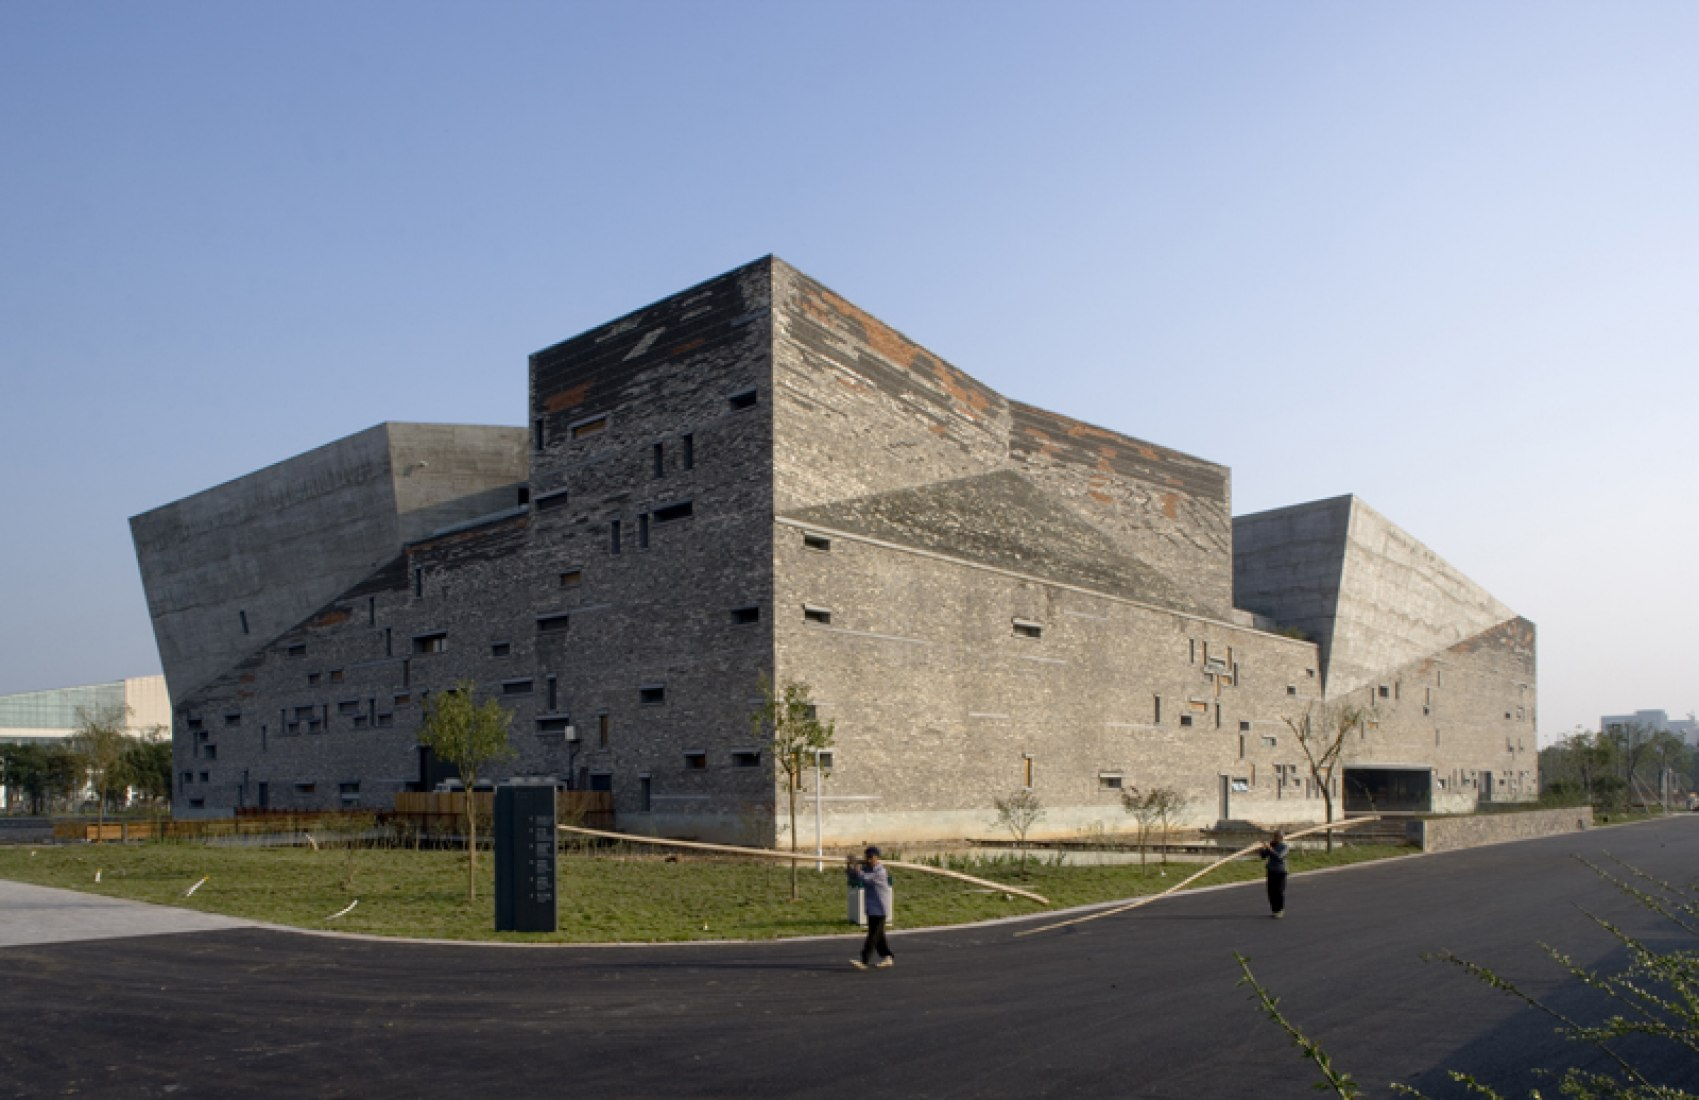 Museo de Historia Ningbo, 2003-2008, Ningbo, China. Foto por Lv Hengzhong.